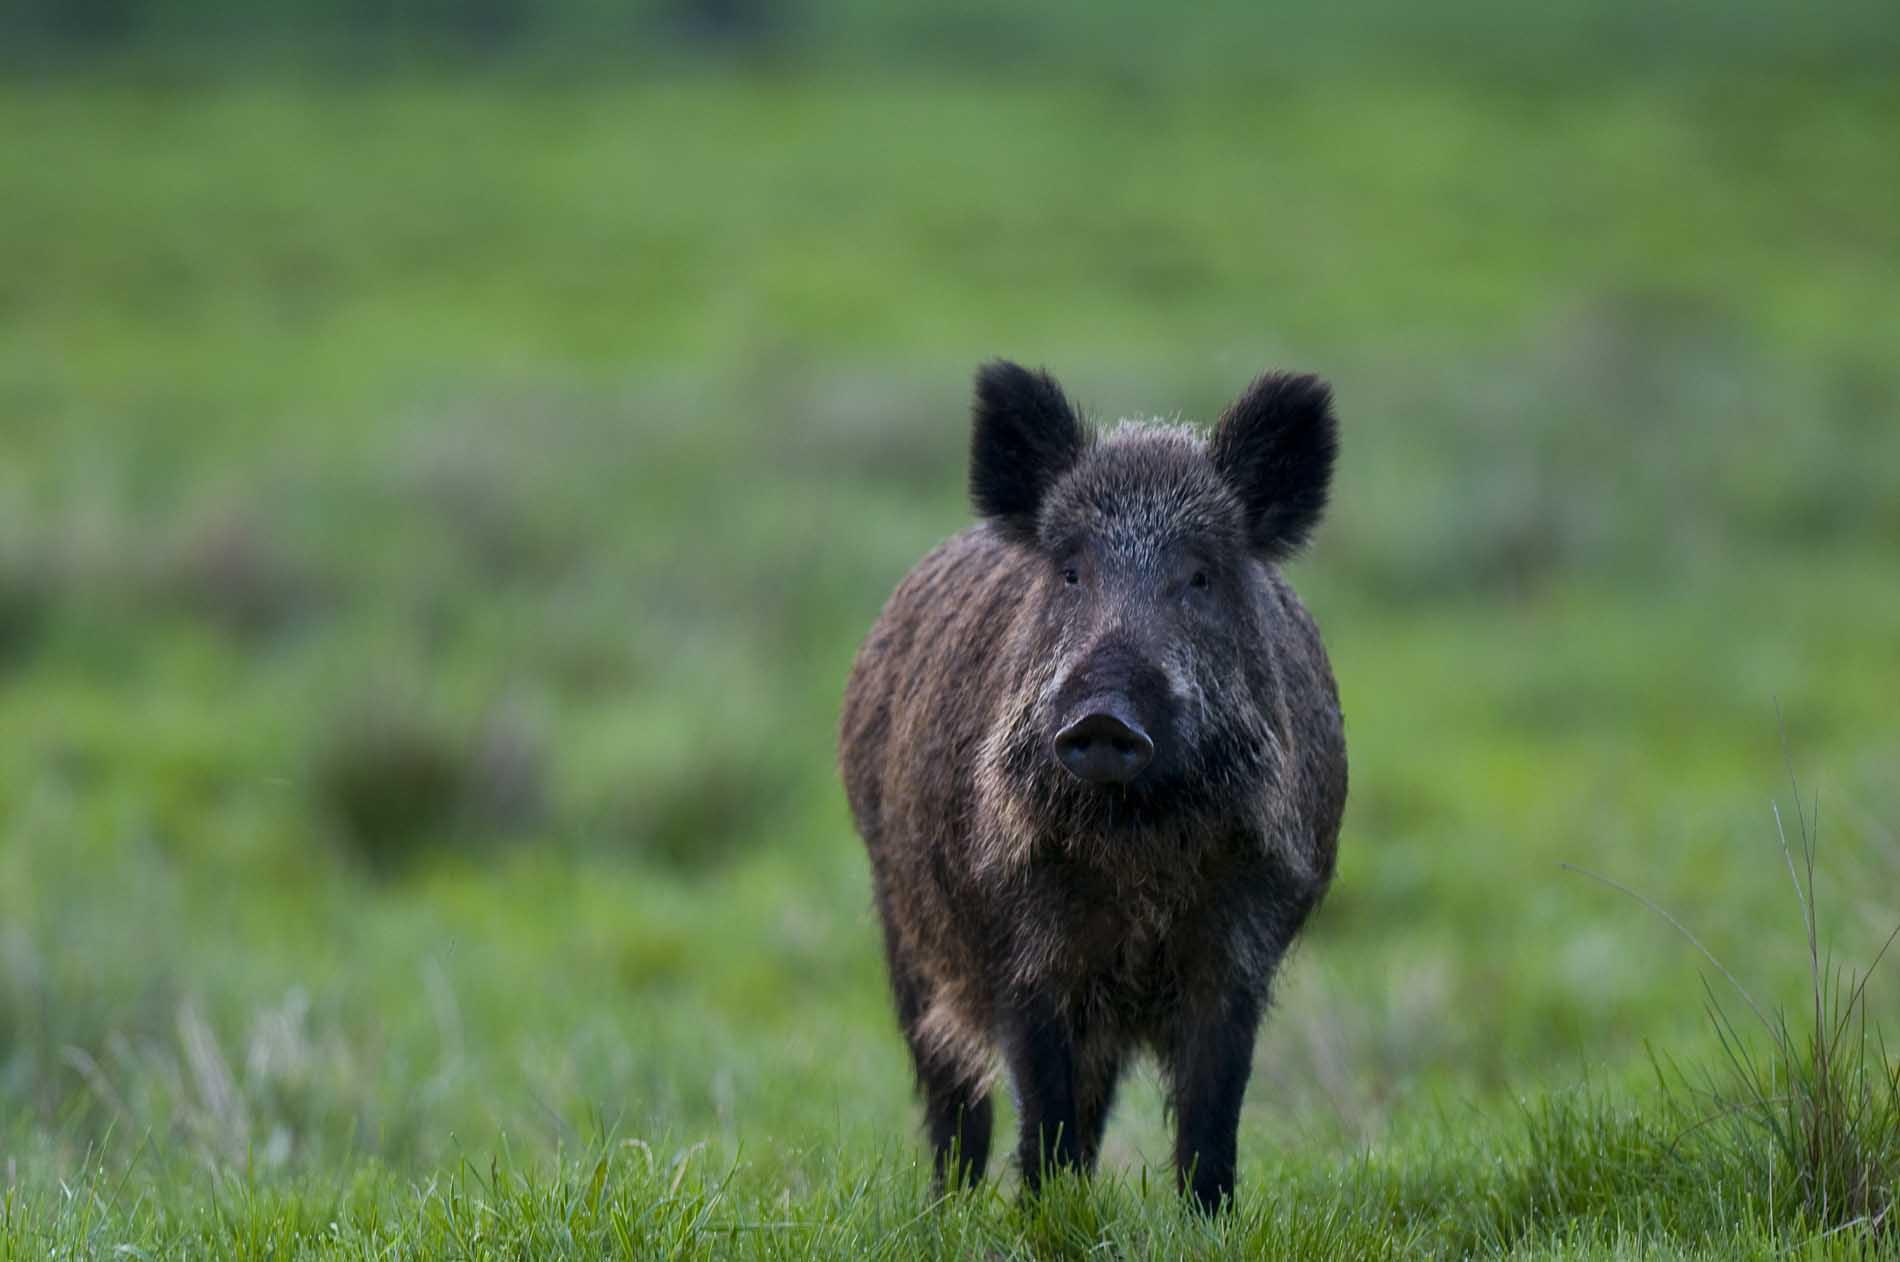 Norrman bedriver olaglig jakt i sverige